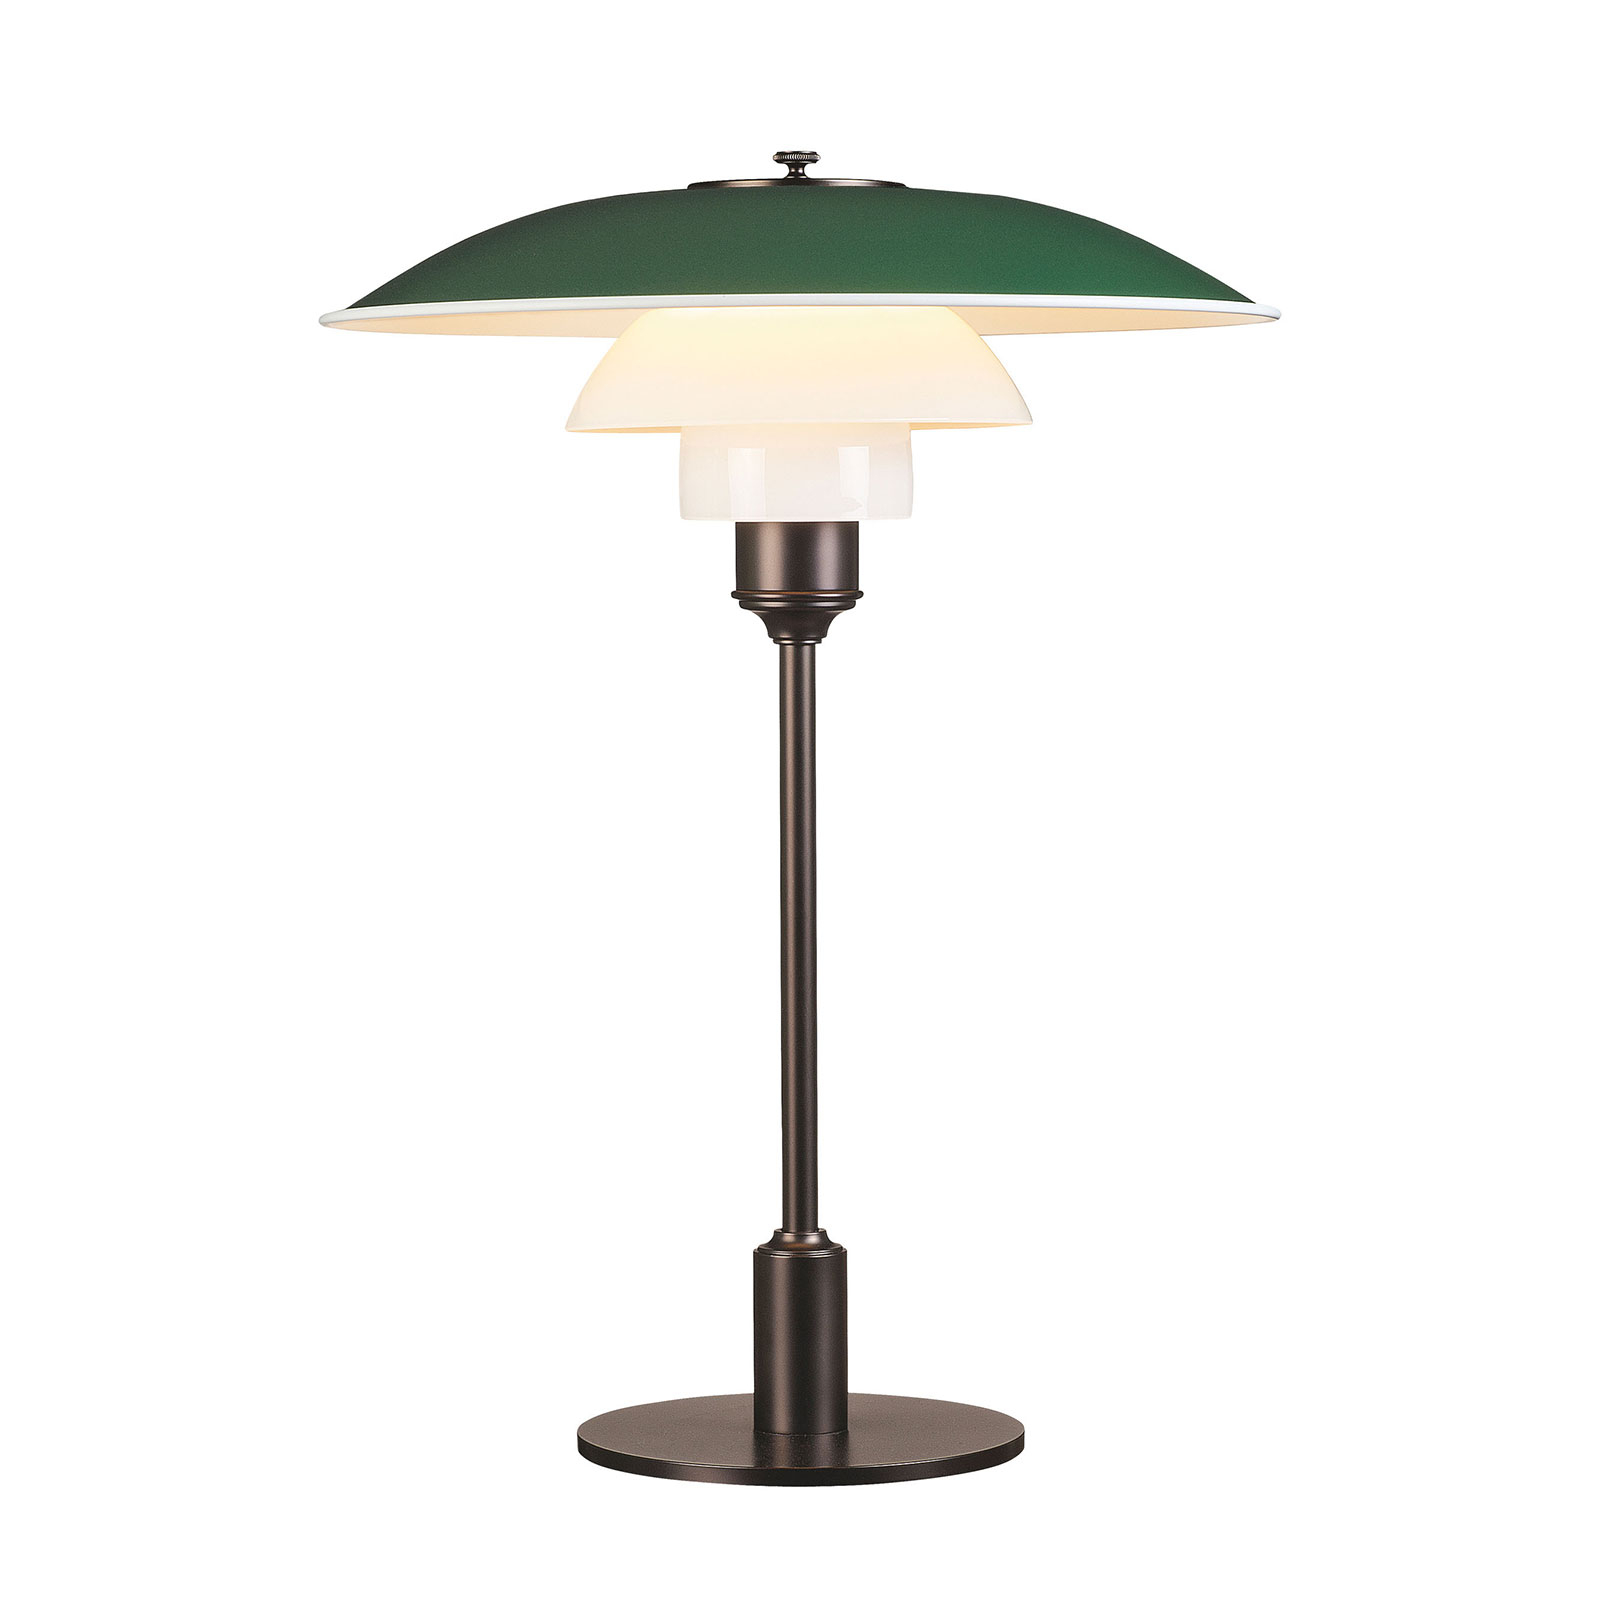 Louis Poulsen PH 3 1/2-2 1/2 bordlampe brun/grønn